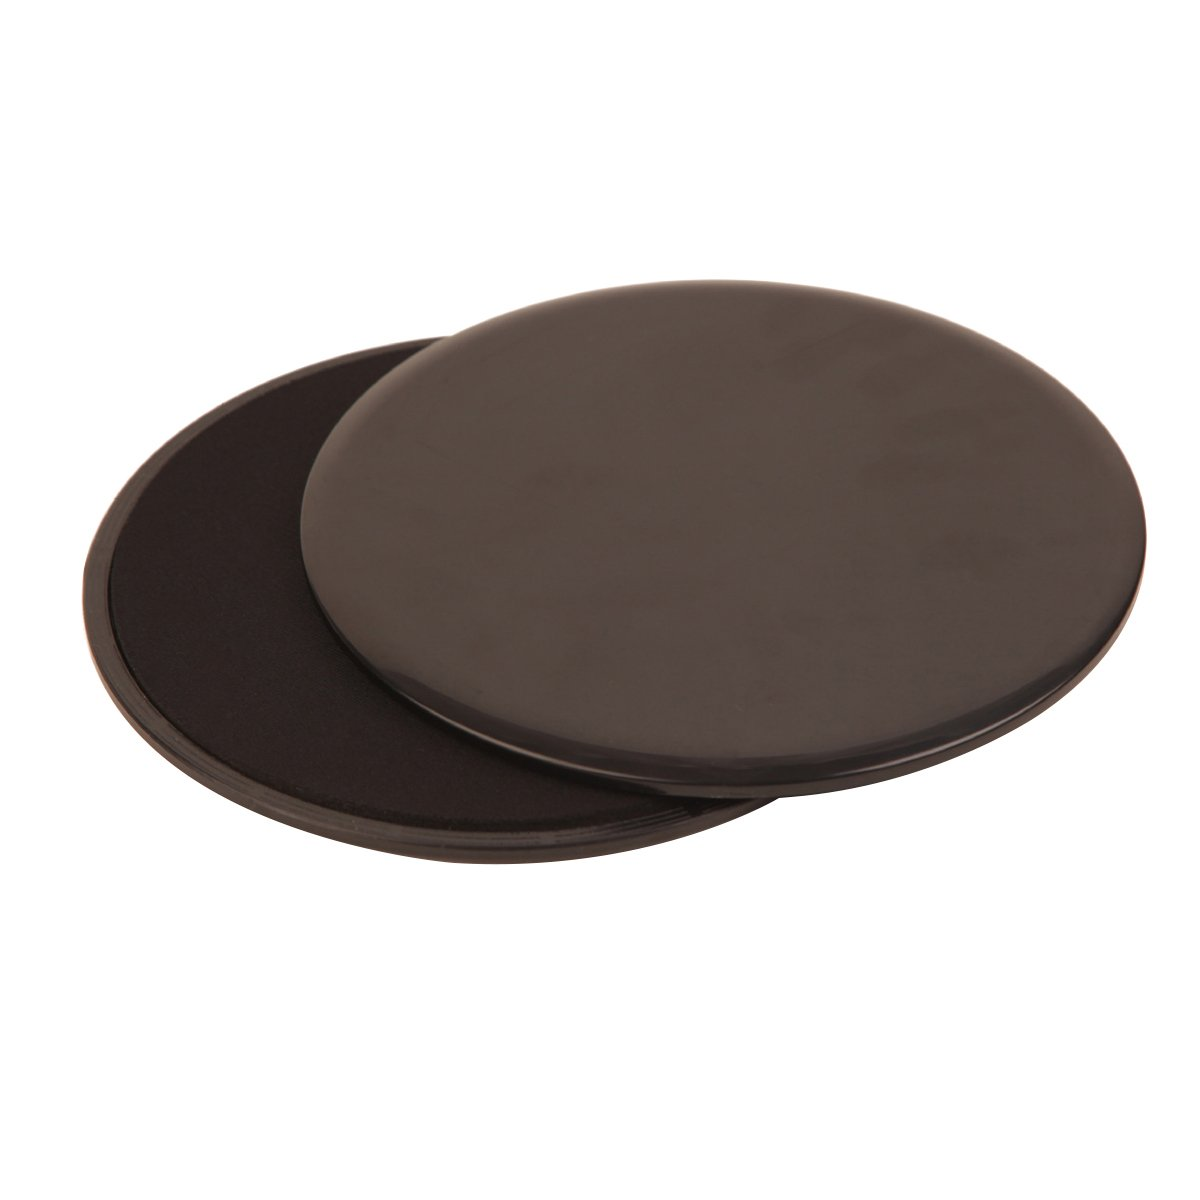 Flytool Gliding Discs Core Sliders Dual Sided Equipment Set of 2 for Carpet and Hardwood Floors, Black